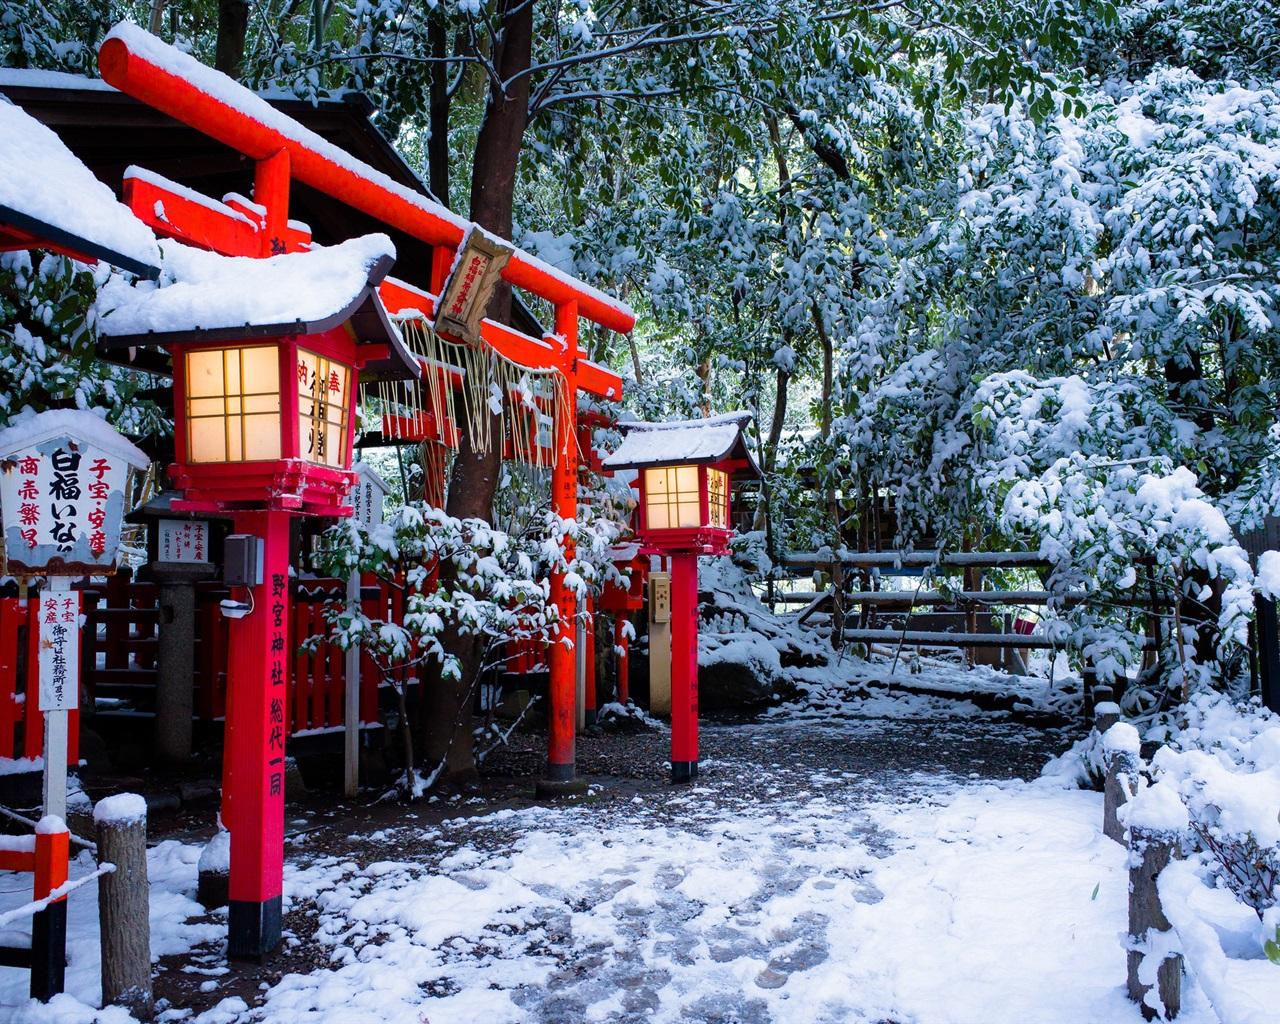 wallpaper shrine torii gate kyoto japan winter snow. Black Bedroom Furniture Sets. Home Design Ideas